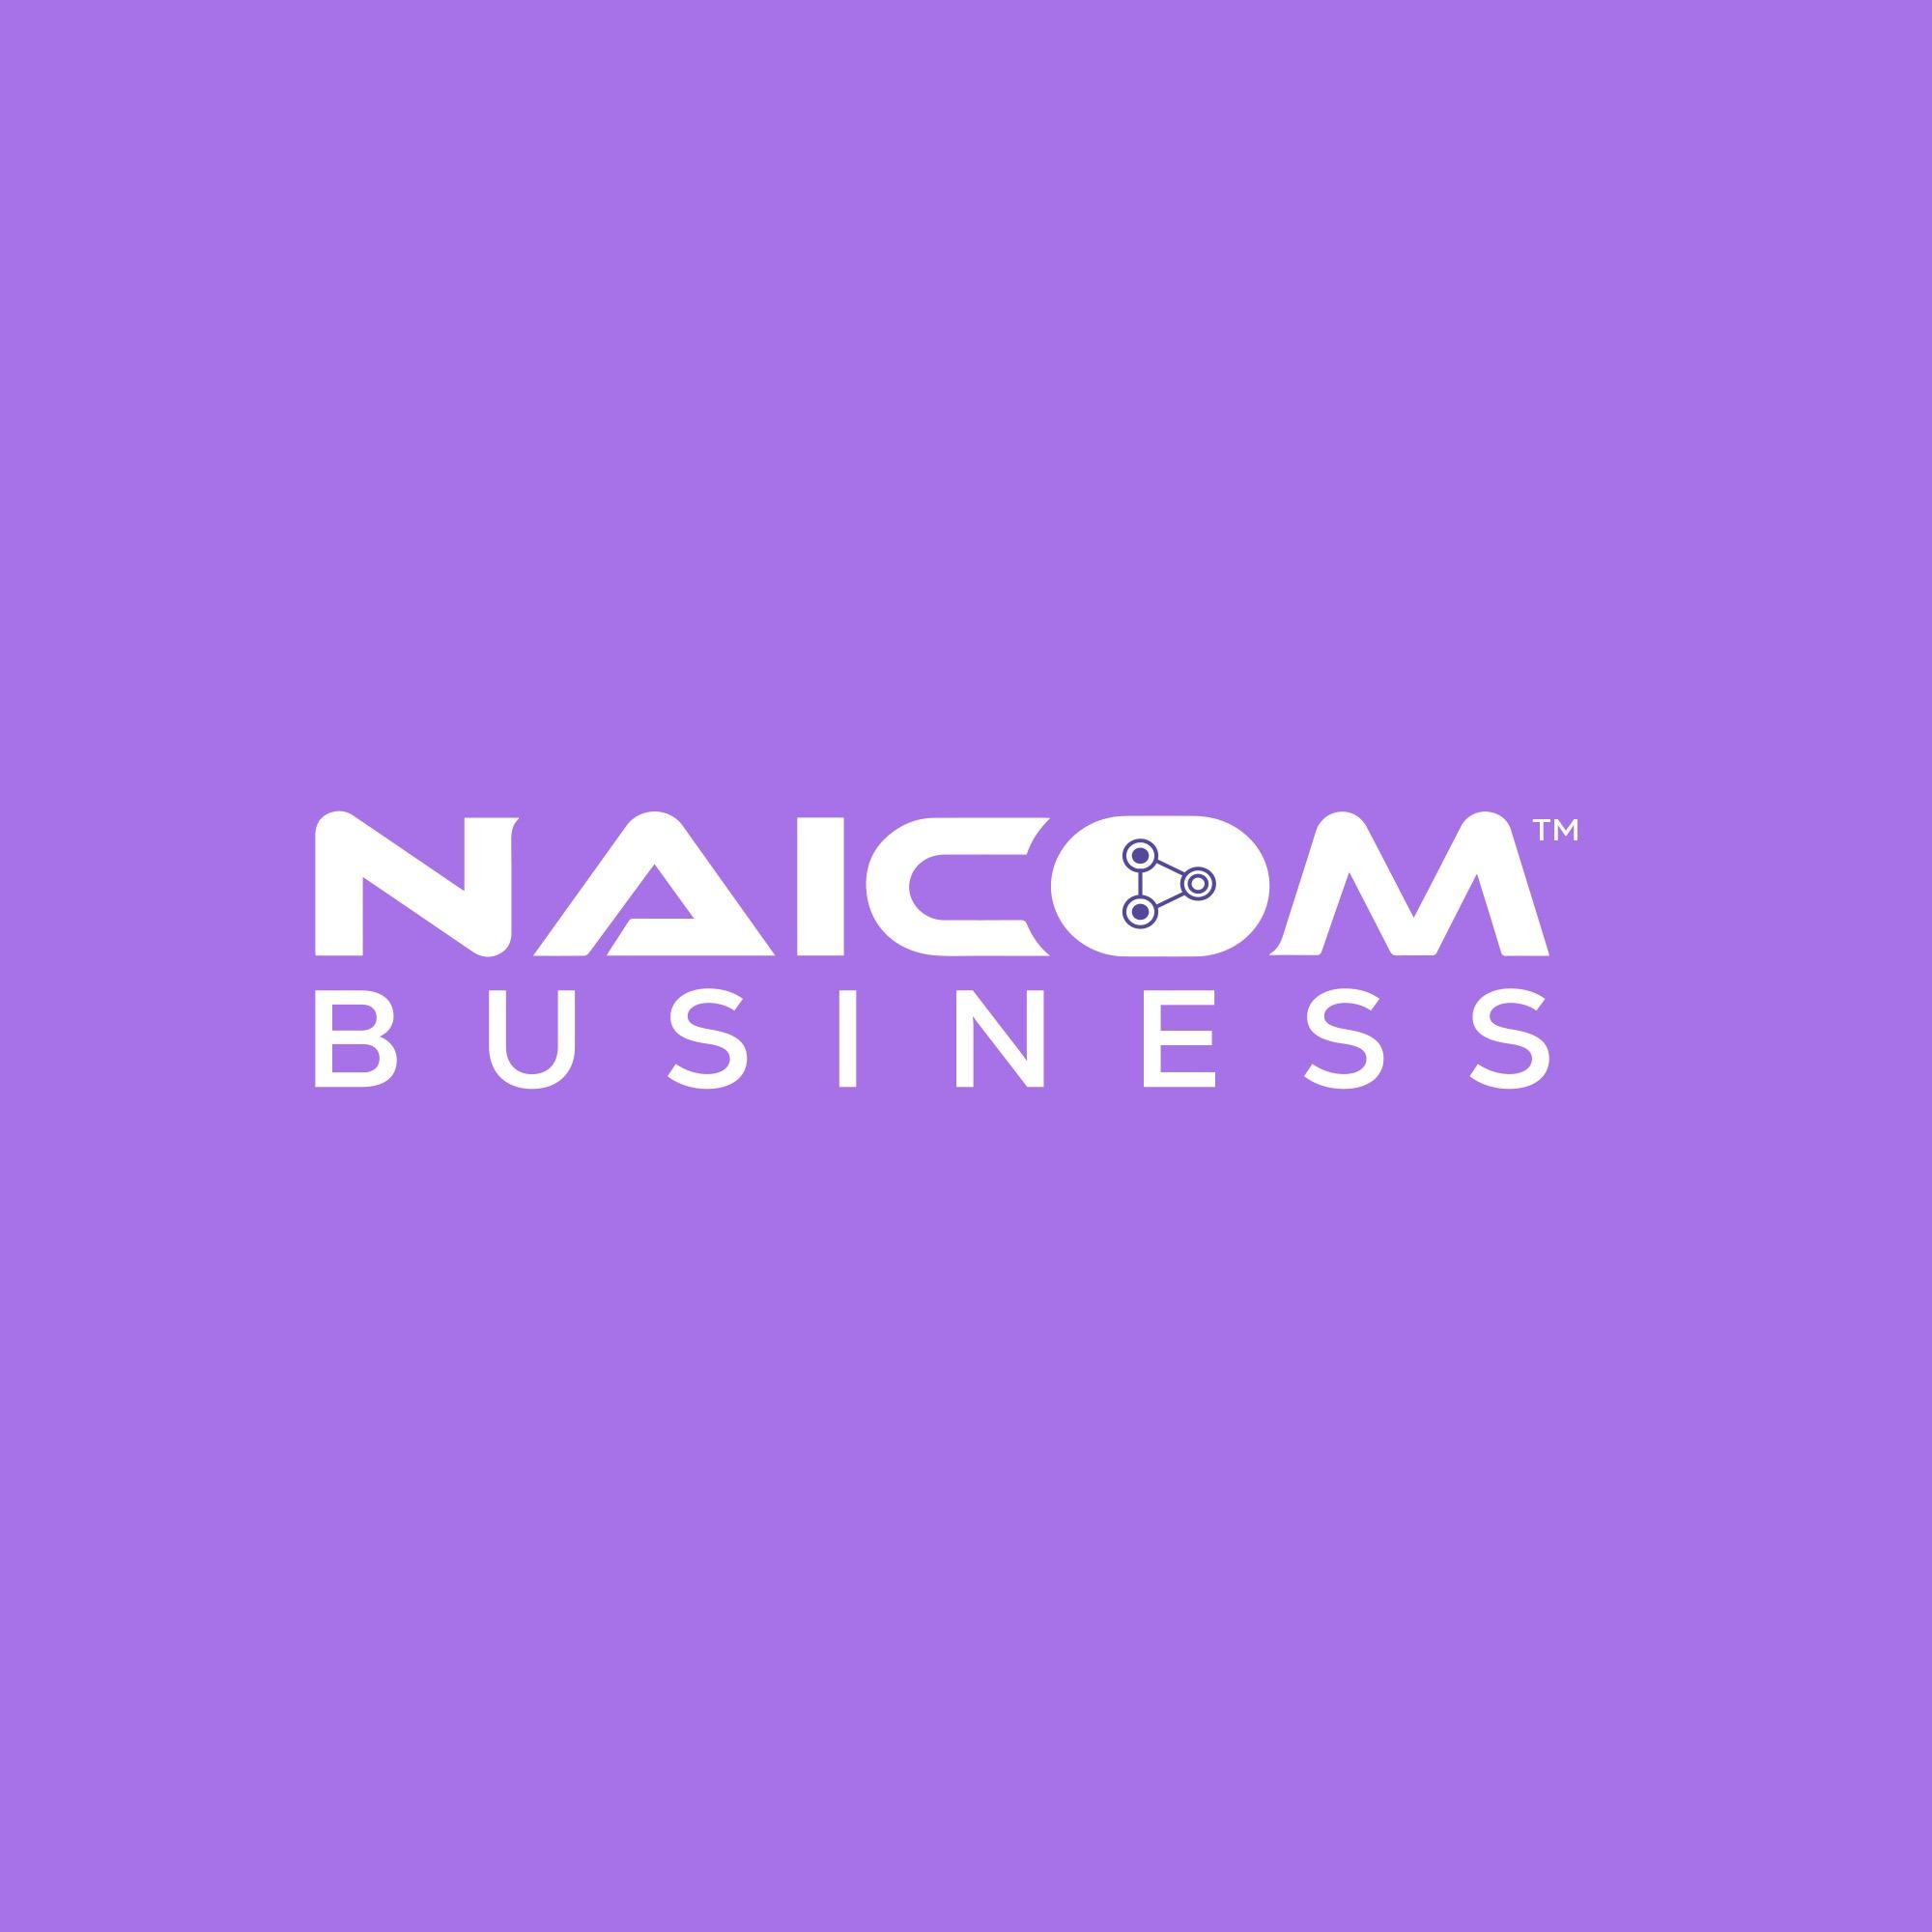 BM_WEB_MOCKUP_MAYO_1BM_WEB_MOCKUP_NaicomBusiness_Logo